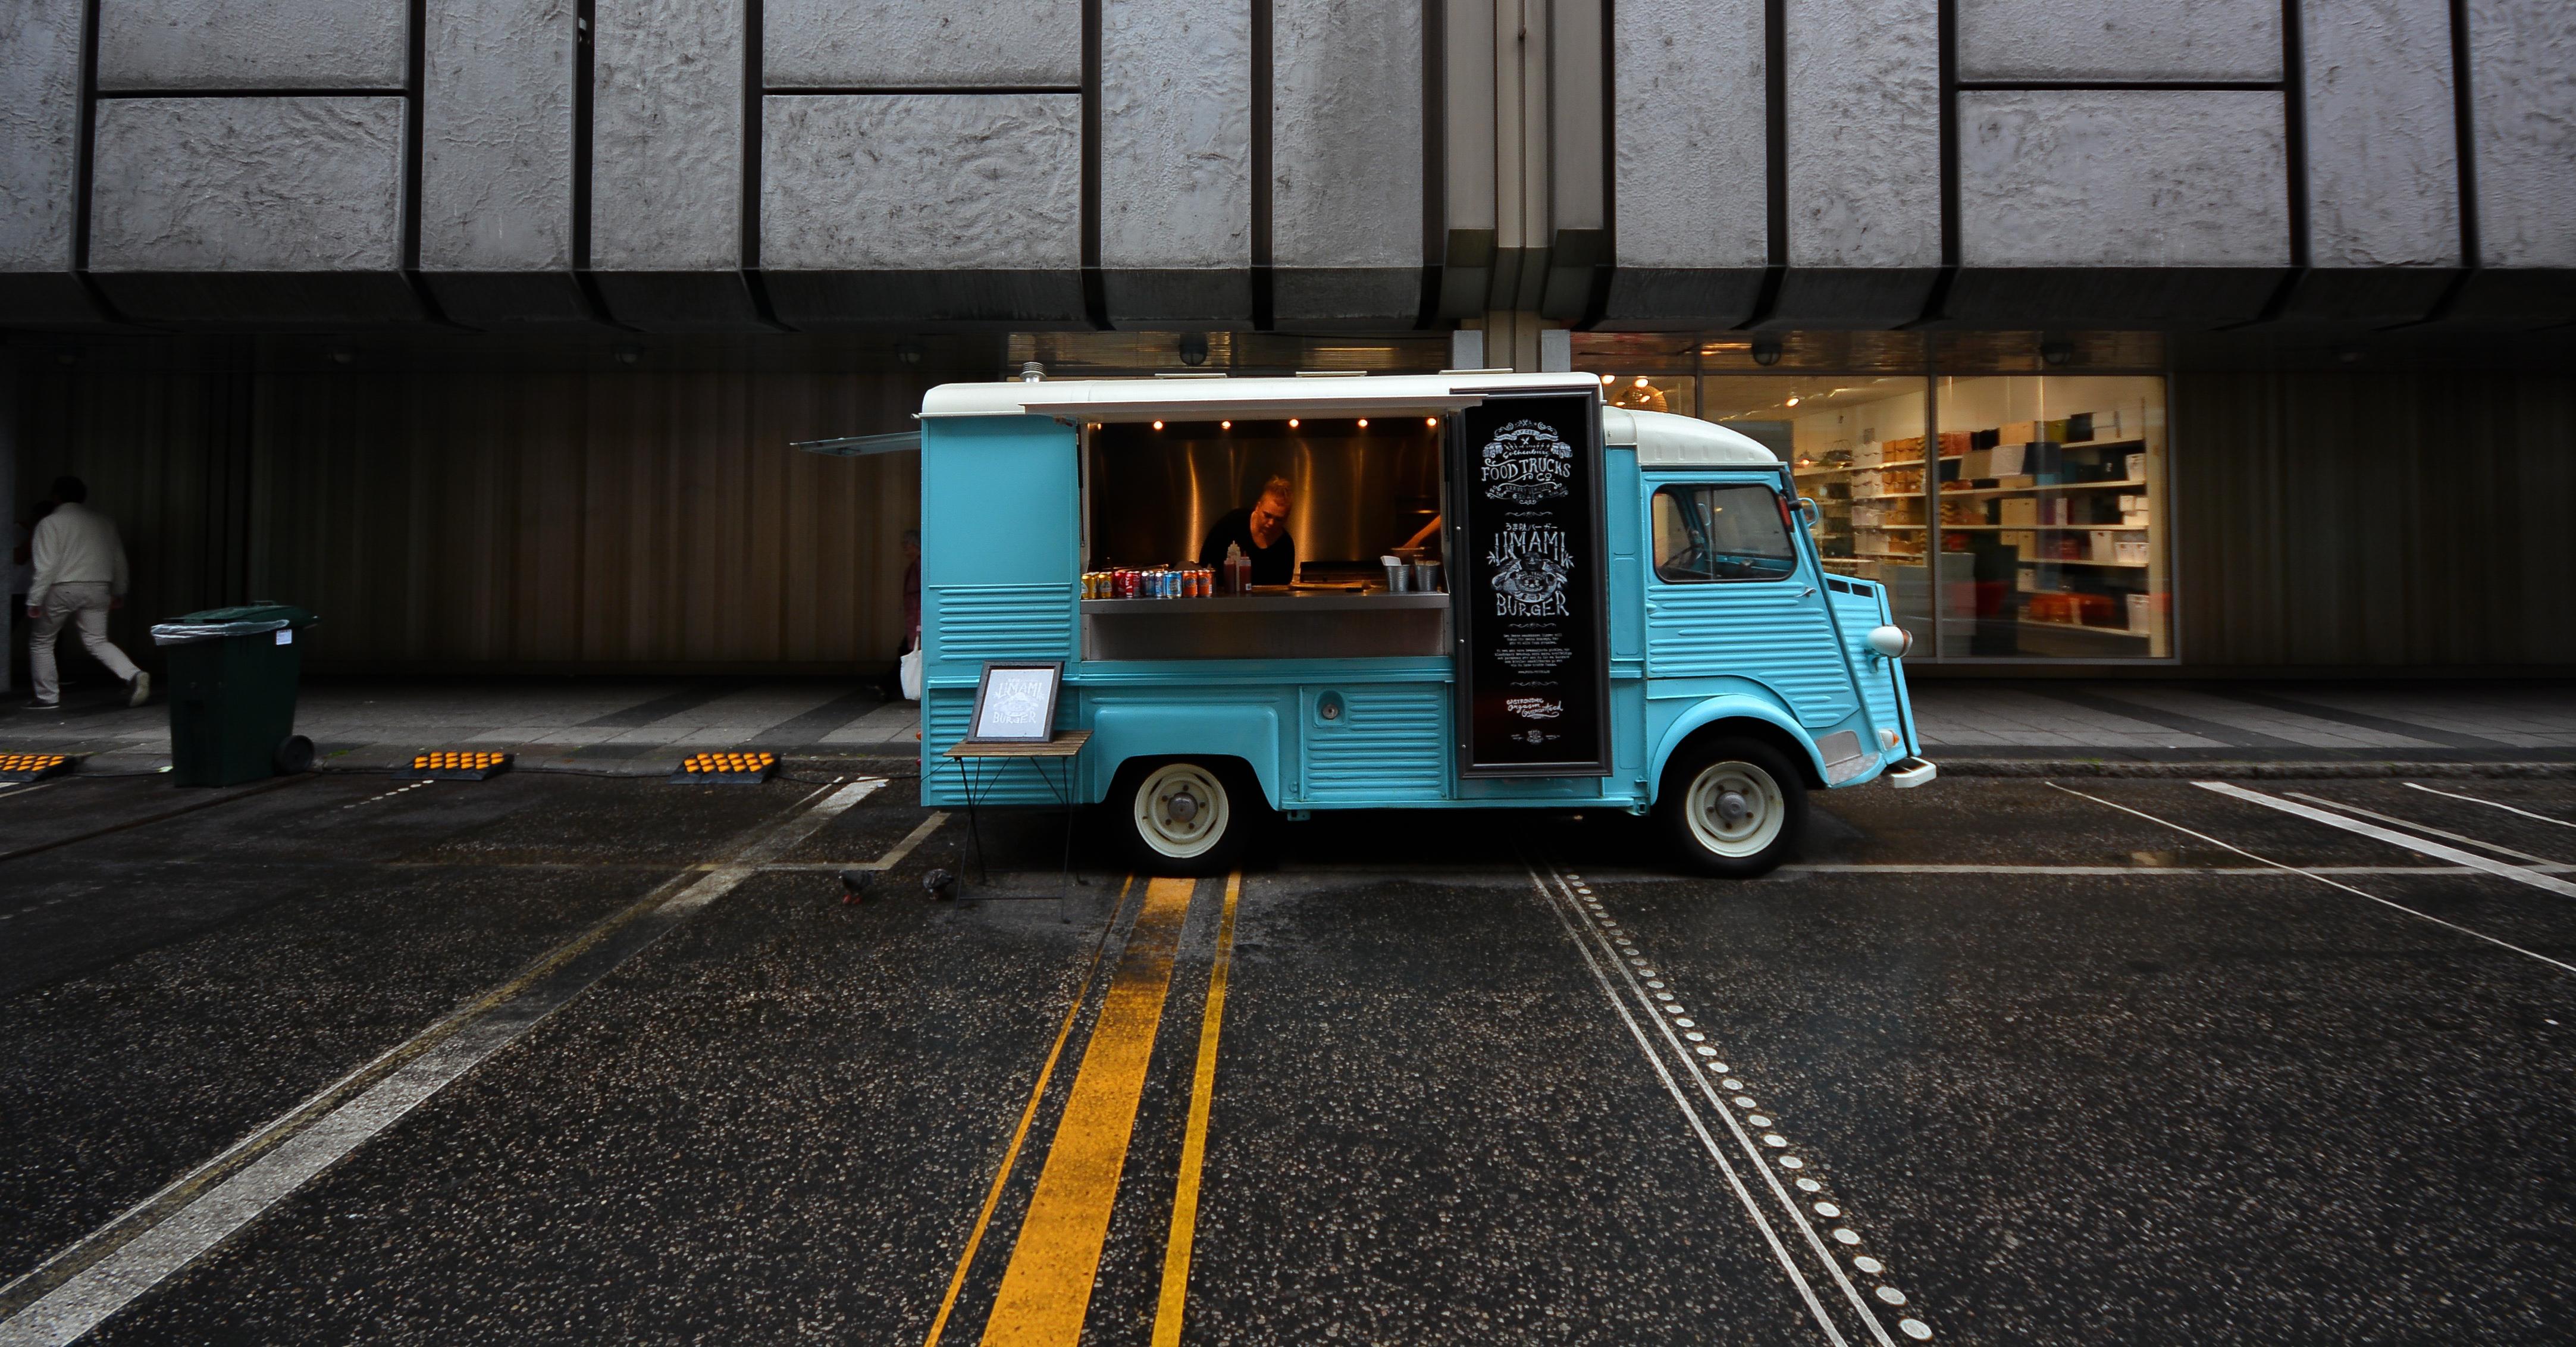 repost assurance sp ciale food truck. Black Bedroom Furniture Sets. Home Design Ideas